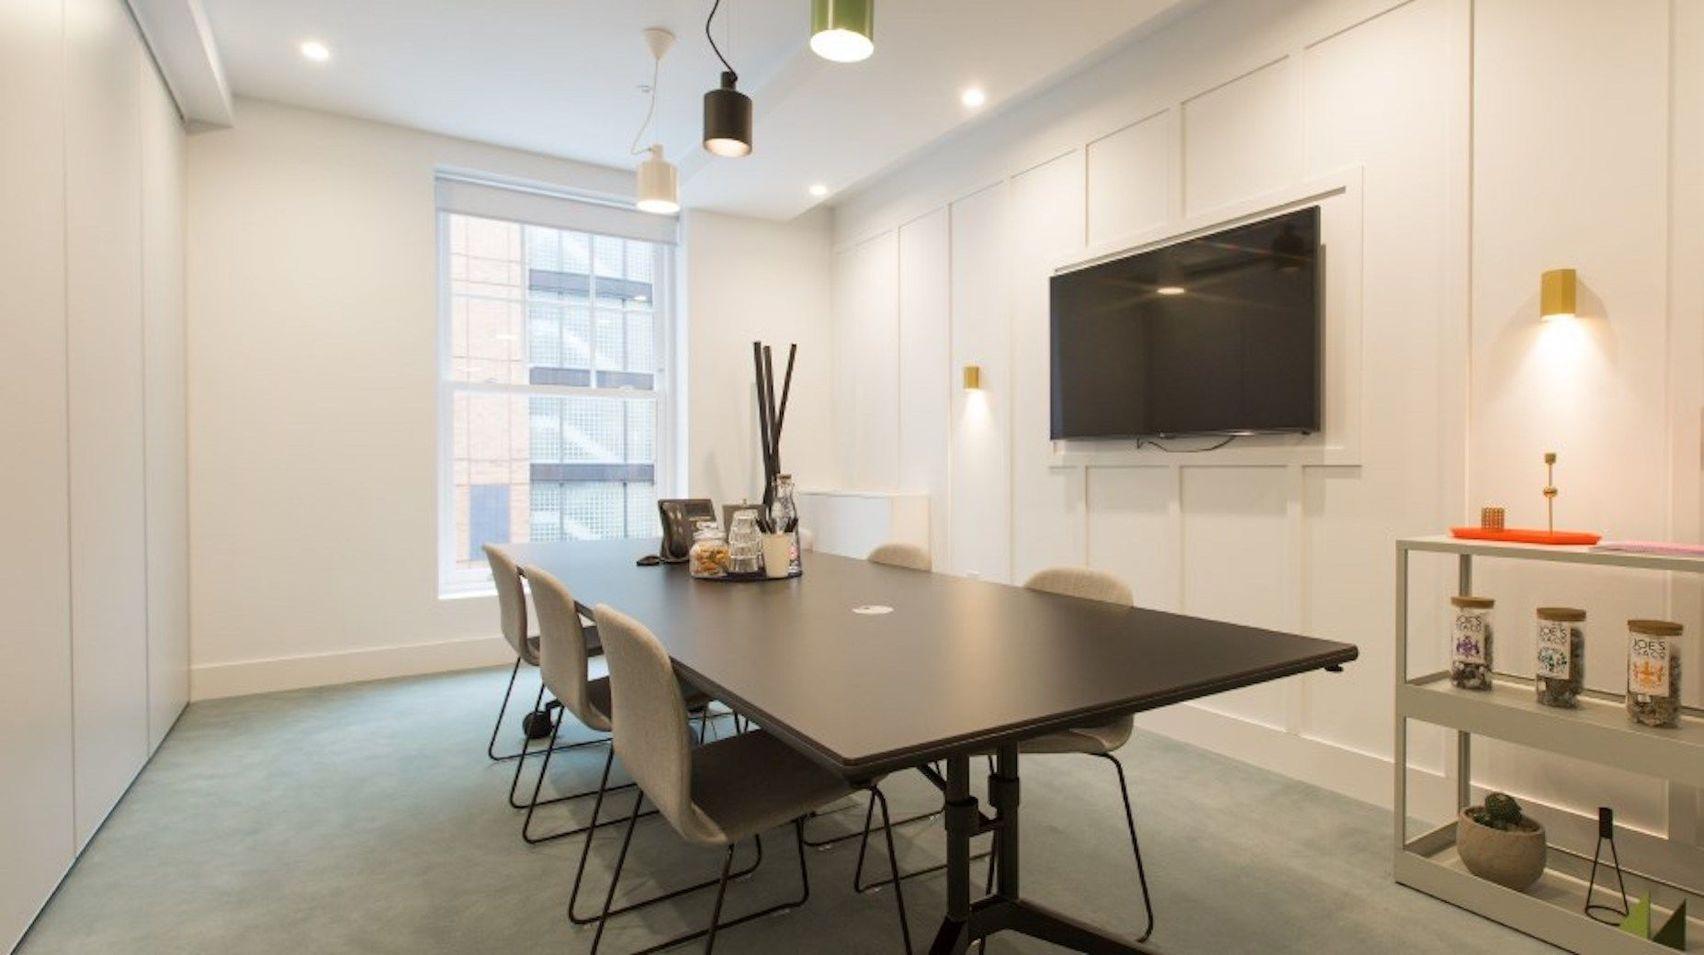 Meeting Room 3, TOG, 91 Wimpole Street